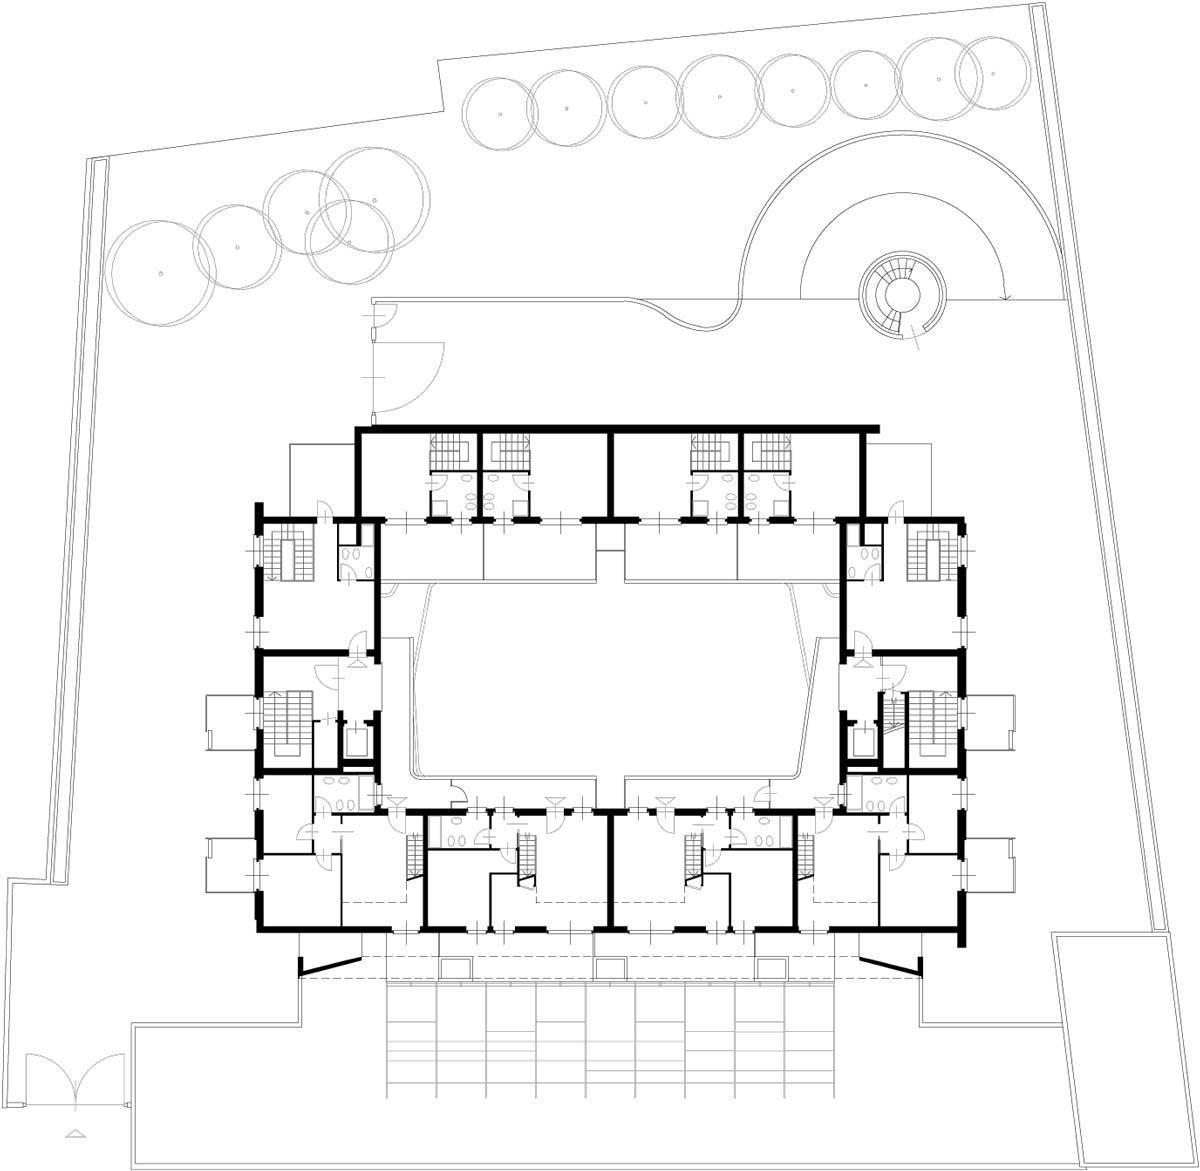 Degli-Esposti-Architetti_Milan-Casa-Anfiro-New-Mixed-Use-Building_02